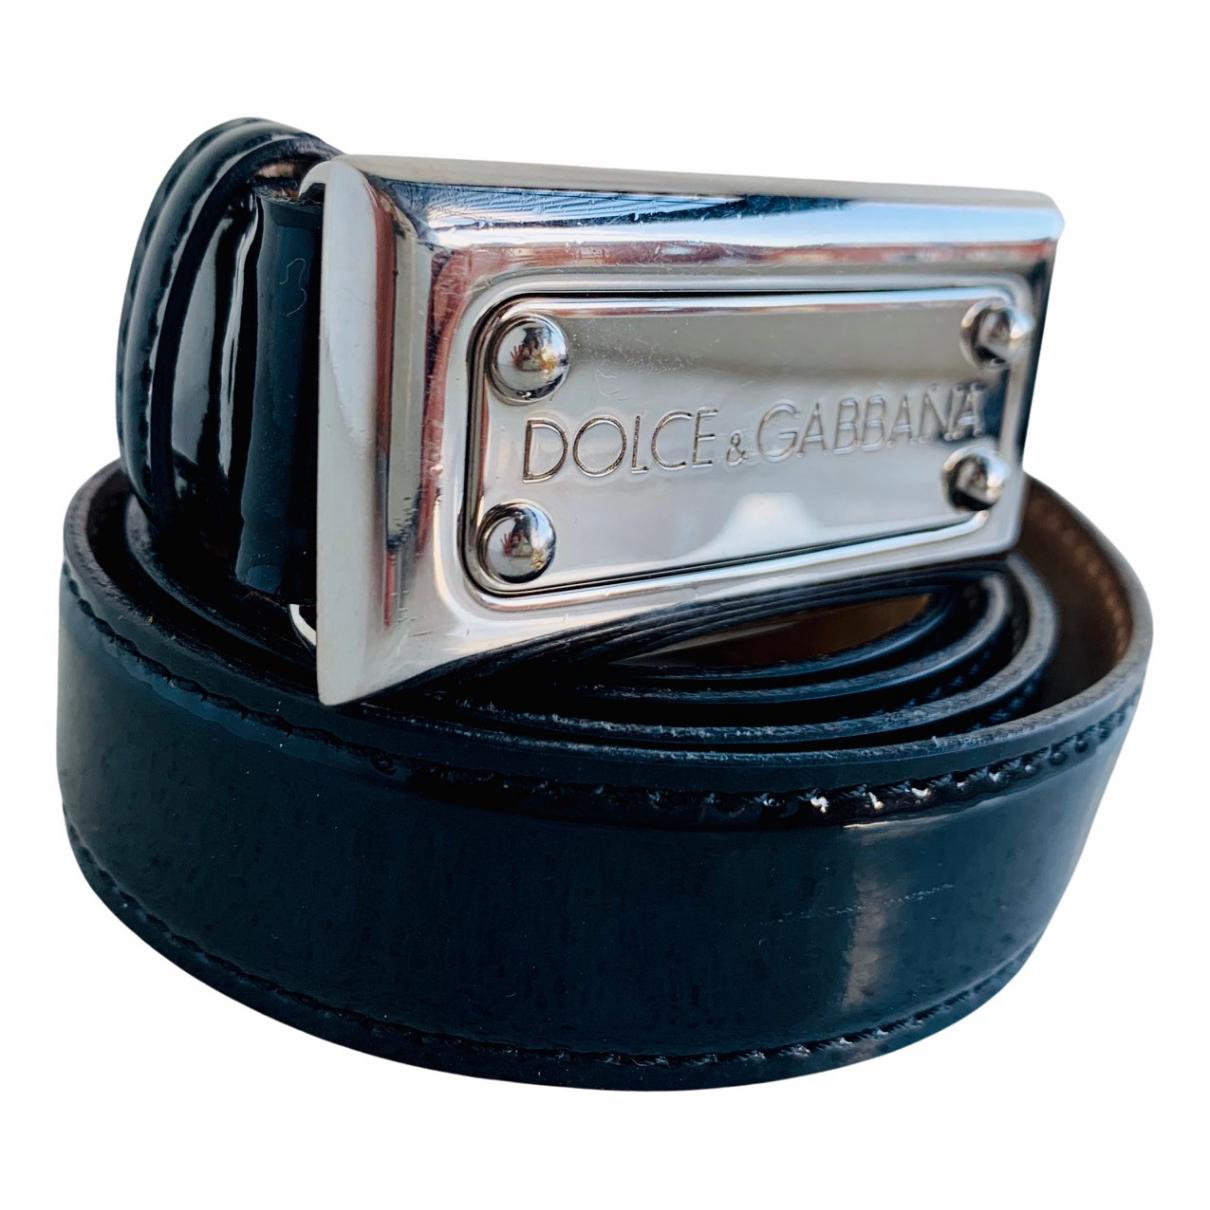 Dolce & Gabbana N Black Patent leather belt for Women 90 cm